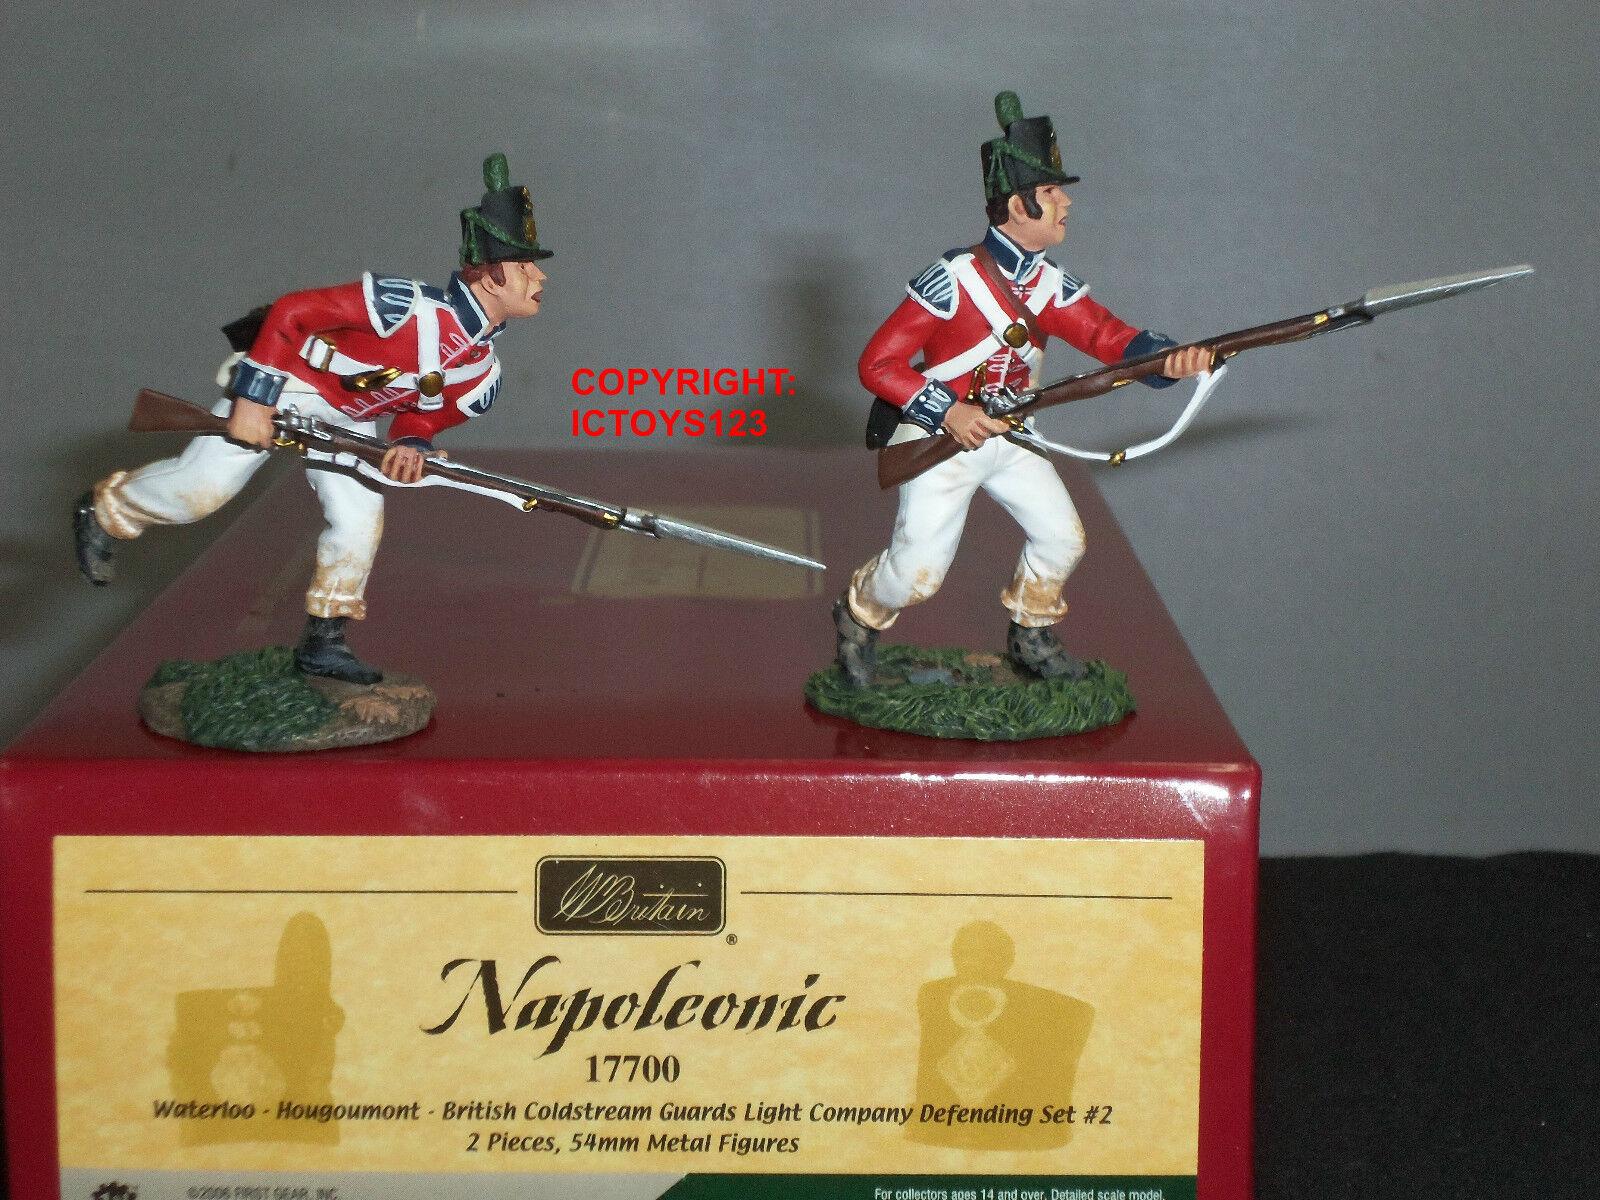 BRITAINS 17700 BRITISH COLDSTREAM GUARDS LIGHT COMPANY DEFENDING FIGURE SET 2